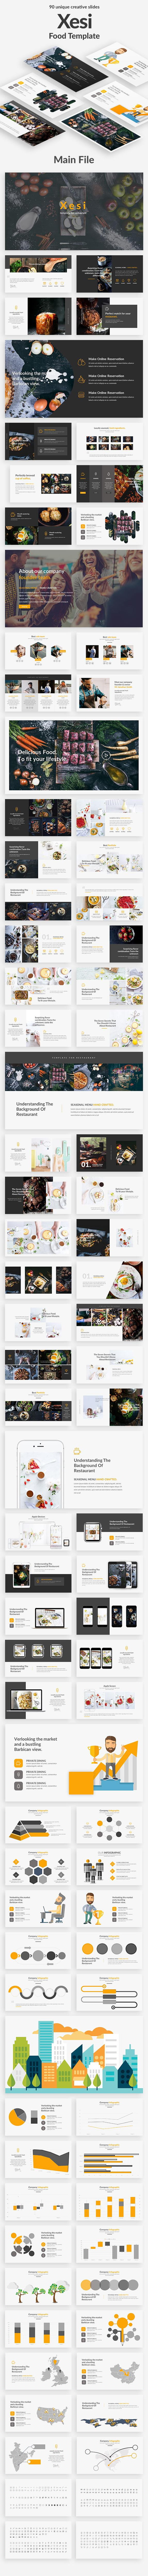 Xesi Food Google Slide Template - Google Slides Presentation Templates